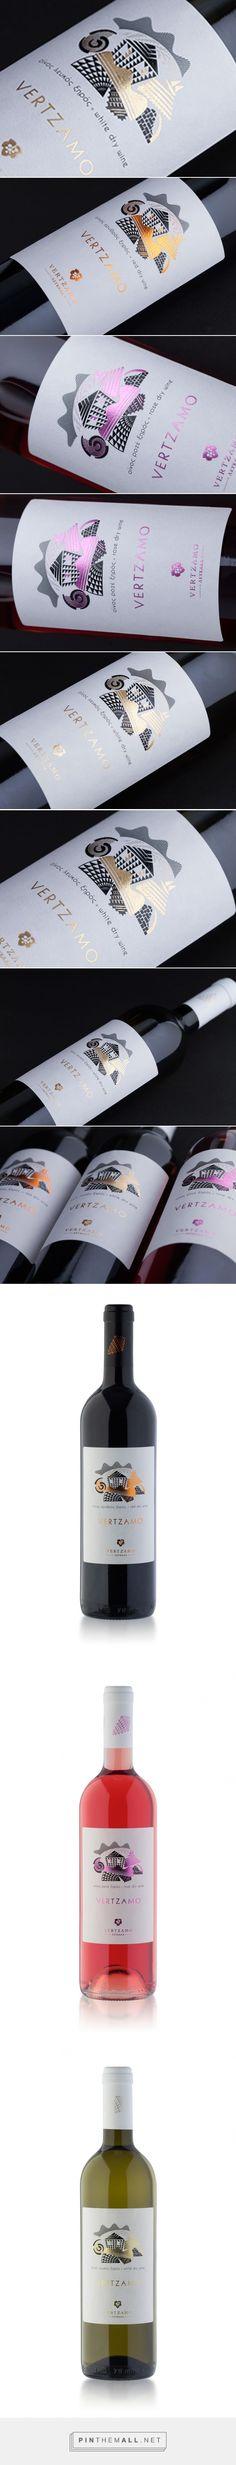 Vertzamo Wines - Packaging of the World - Creative Package Design Gallery - http://www.packagingoftheworld.com/2016/06/vertzamo-wines.html